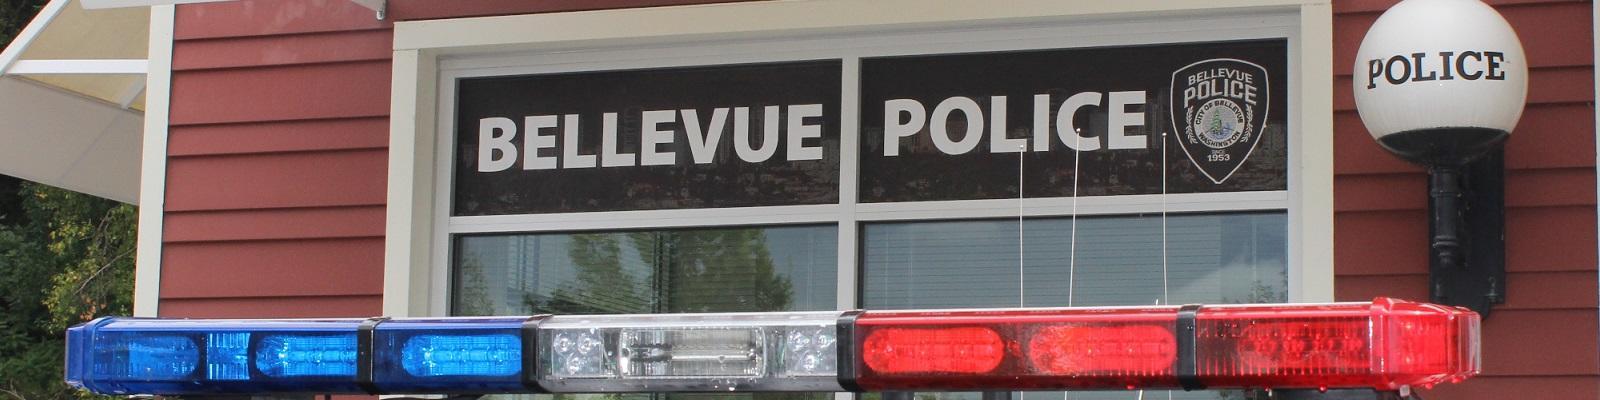 Report a Crime Online | City of Bellevue